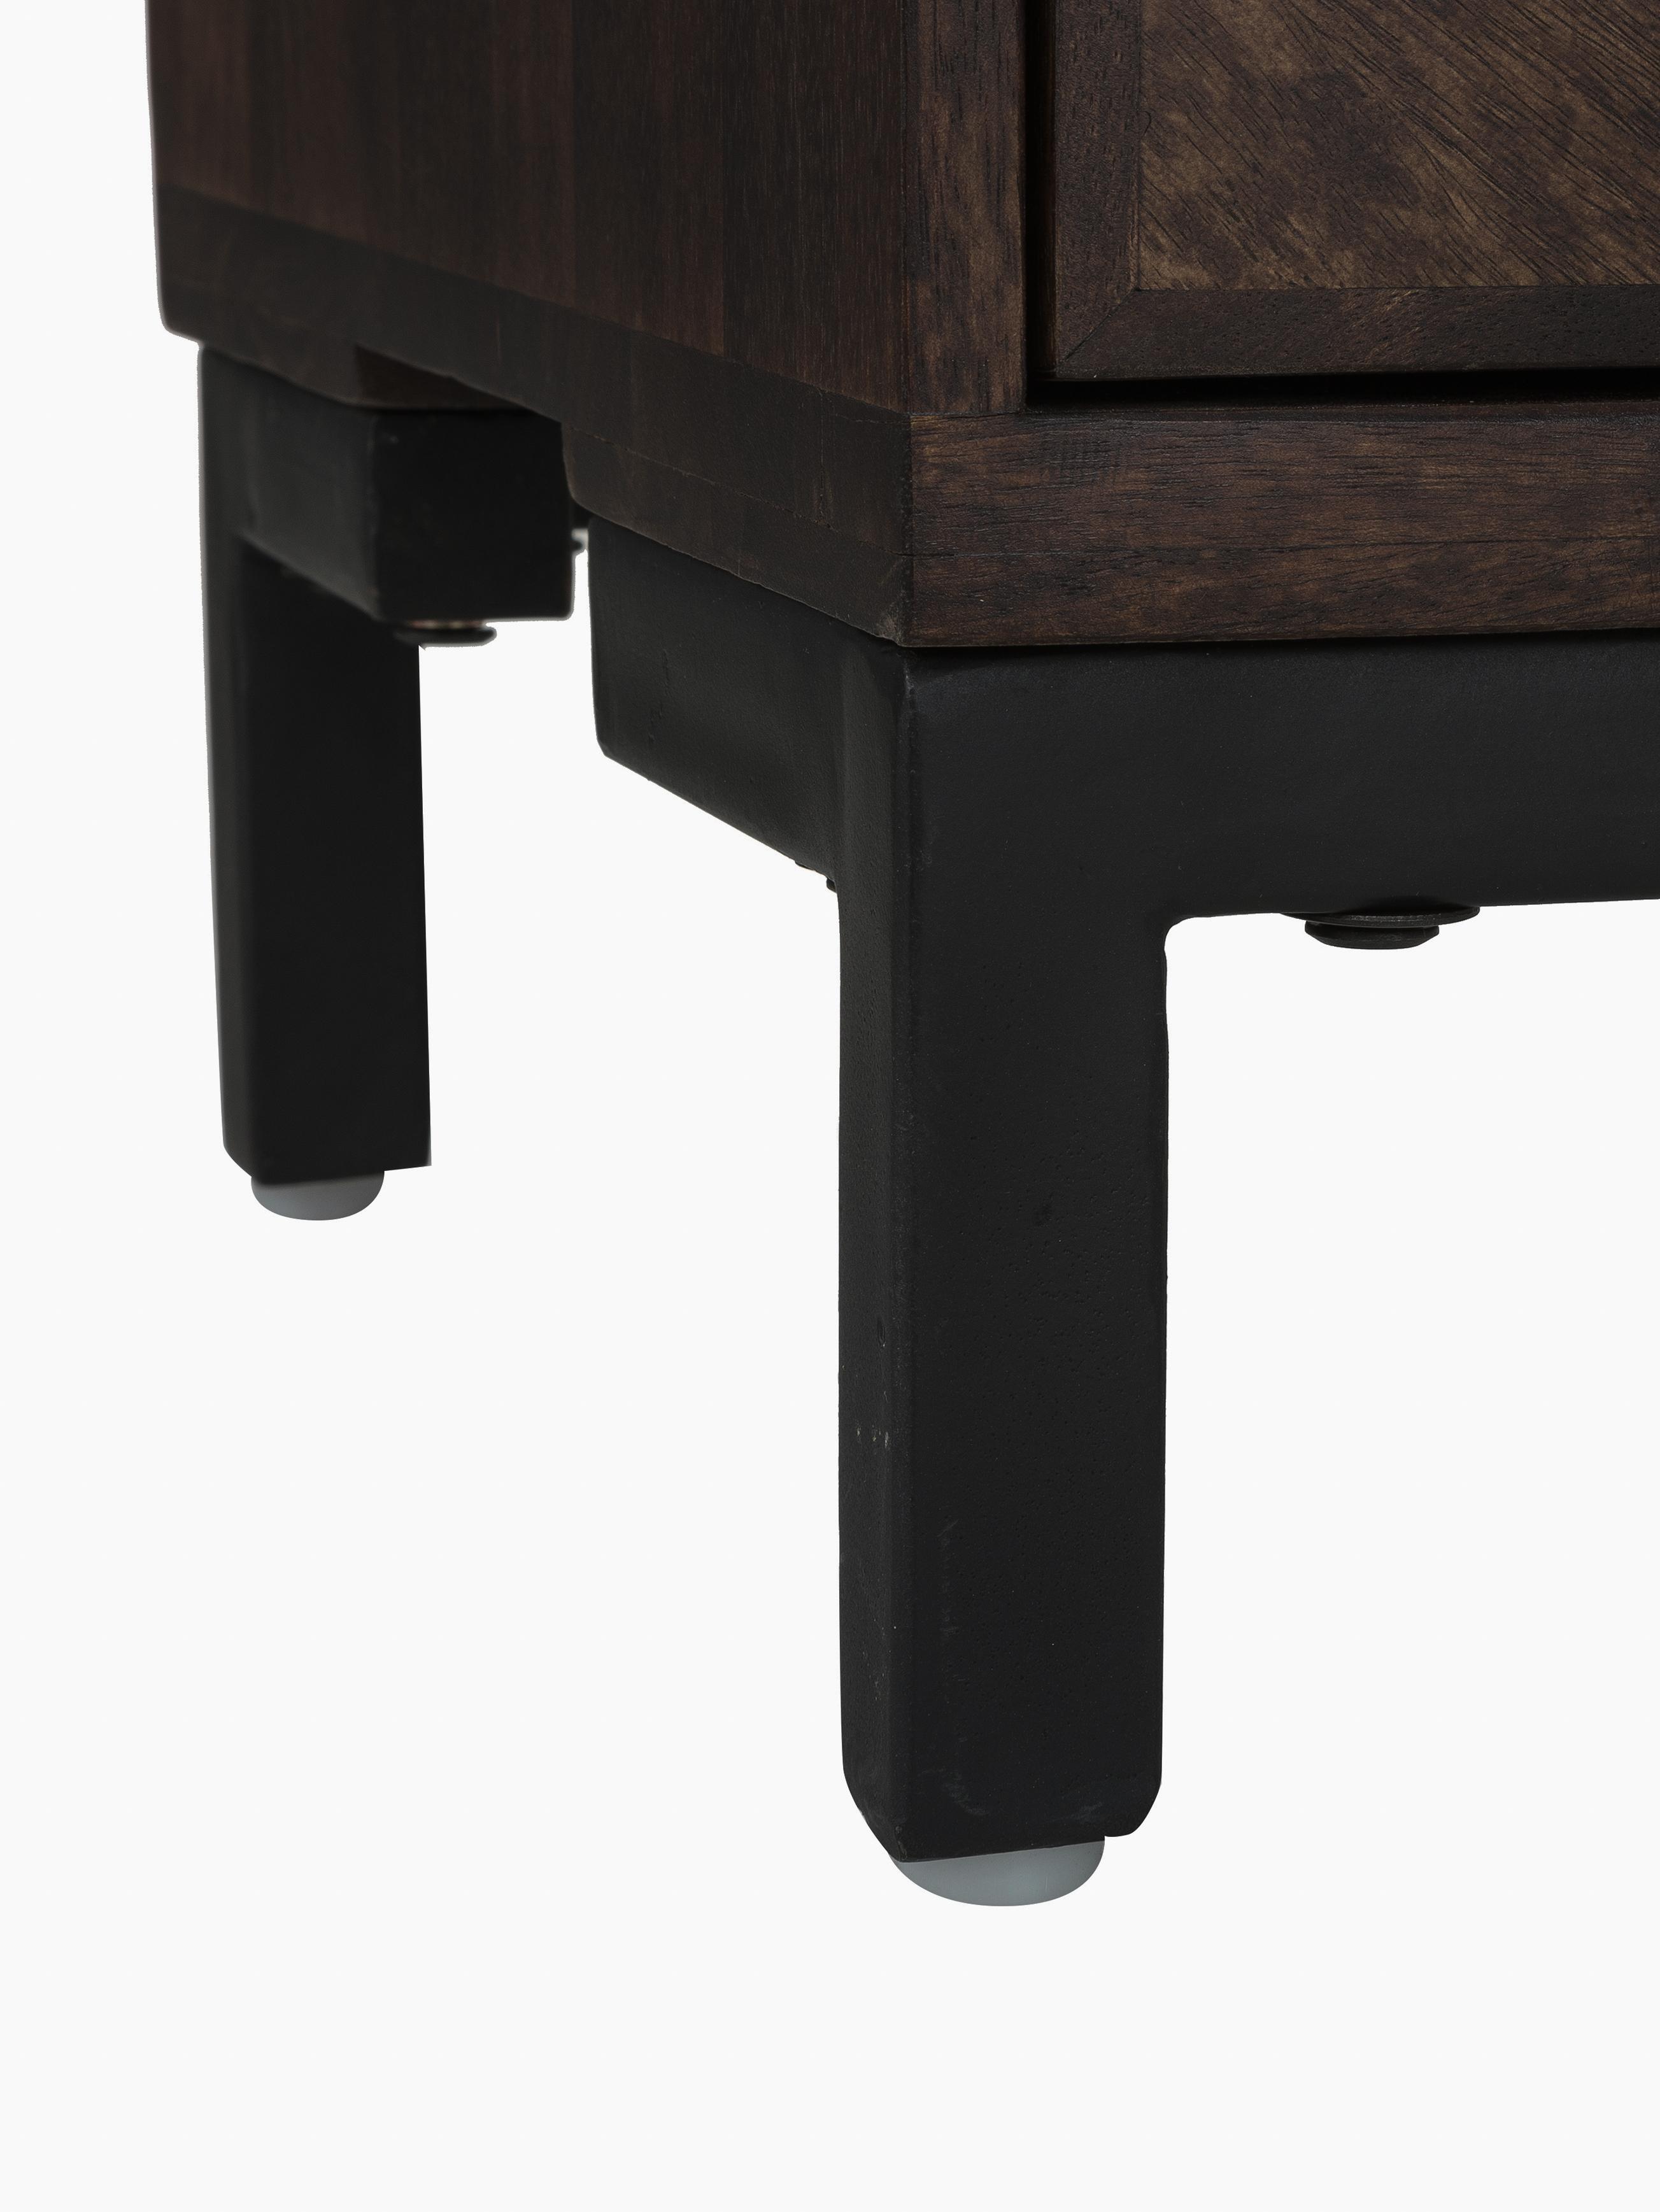 Sideboard Leif aus massiven Mangoholz, Korpus: Mangoholz, massiv, lackie, Griffe: Metall, galvanisiert, Füße: Metall, pulverbeschichtet, Korpus: Mangoholz in dunklem FinishFüße: SchwarzGriffe: Metall, 177 x 75 cm